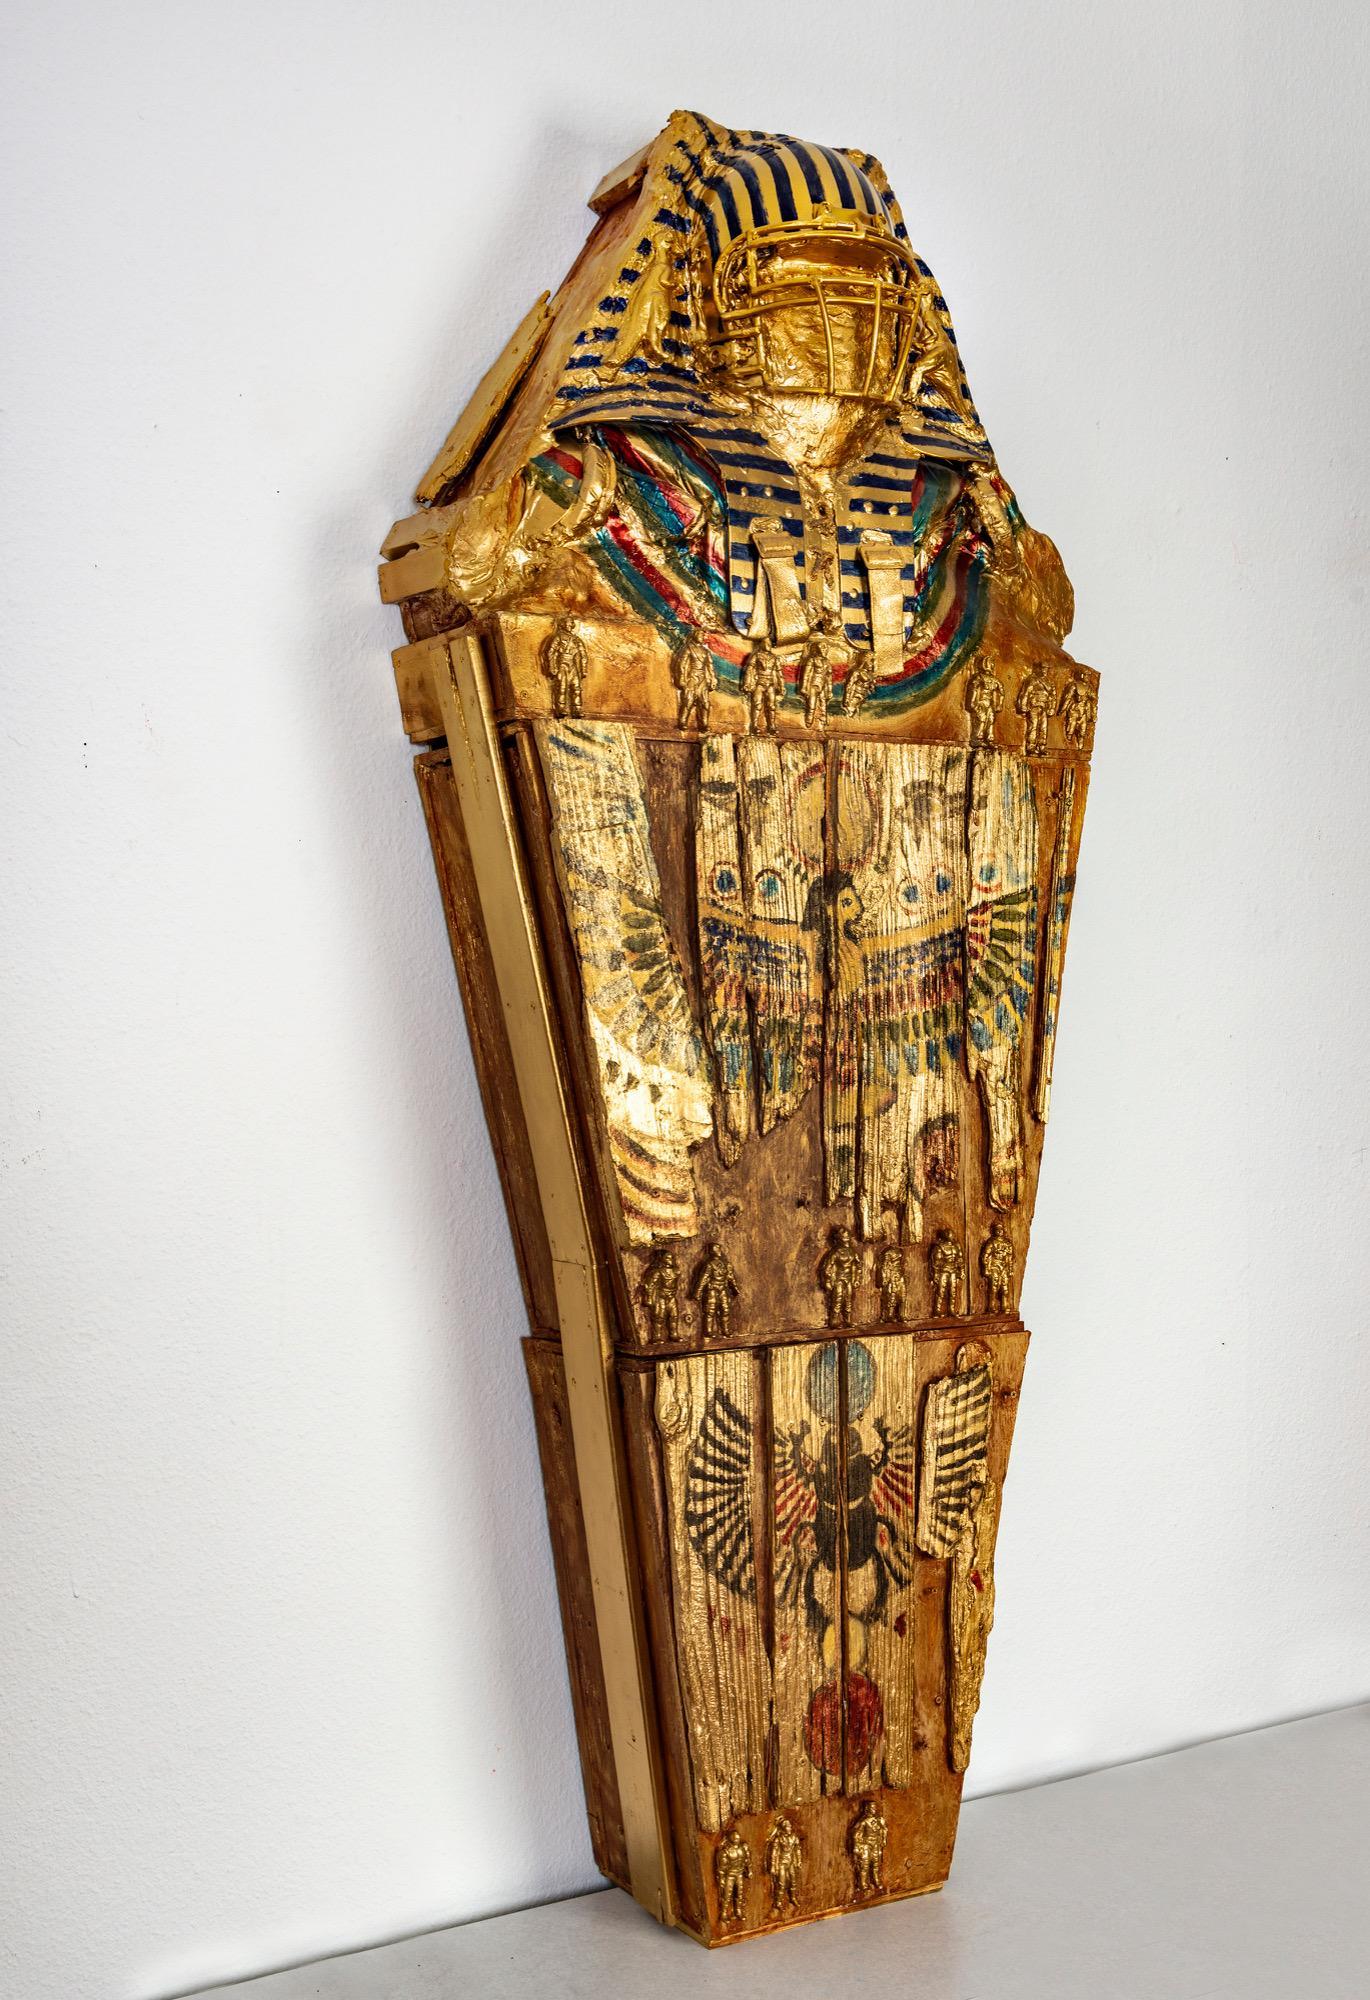 Large free standing sculpture: 'Sacrophagus of a Rhoman King'